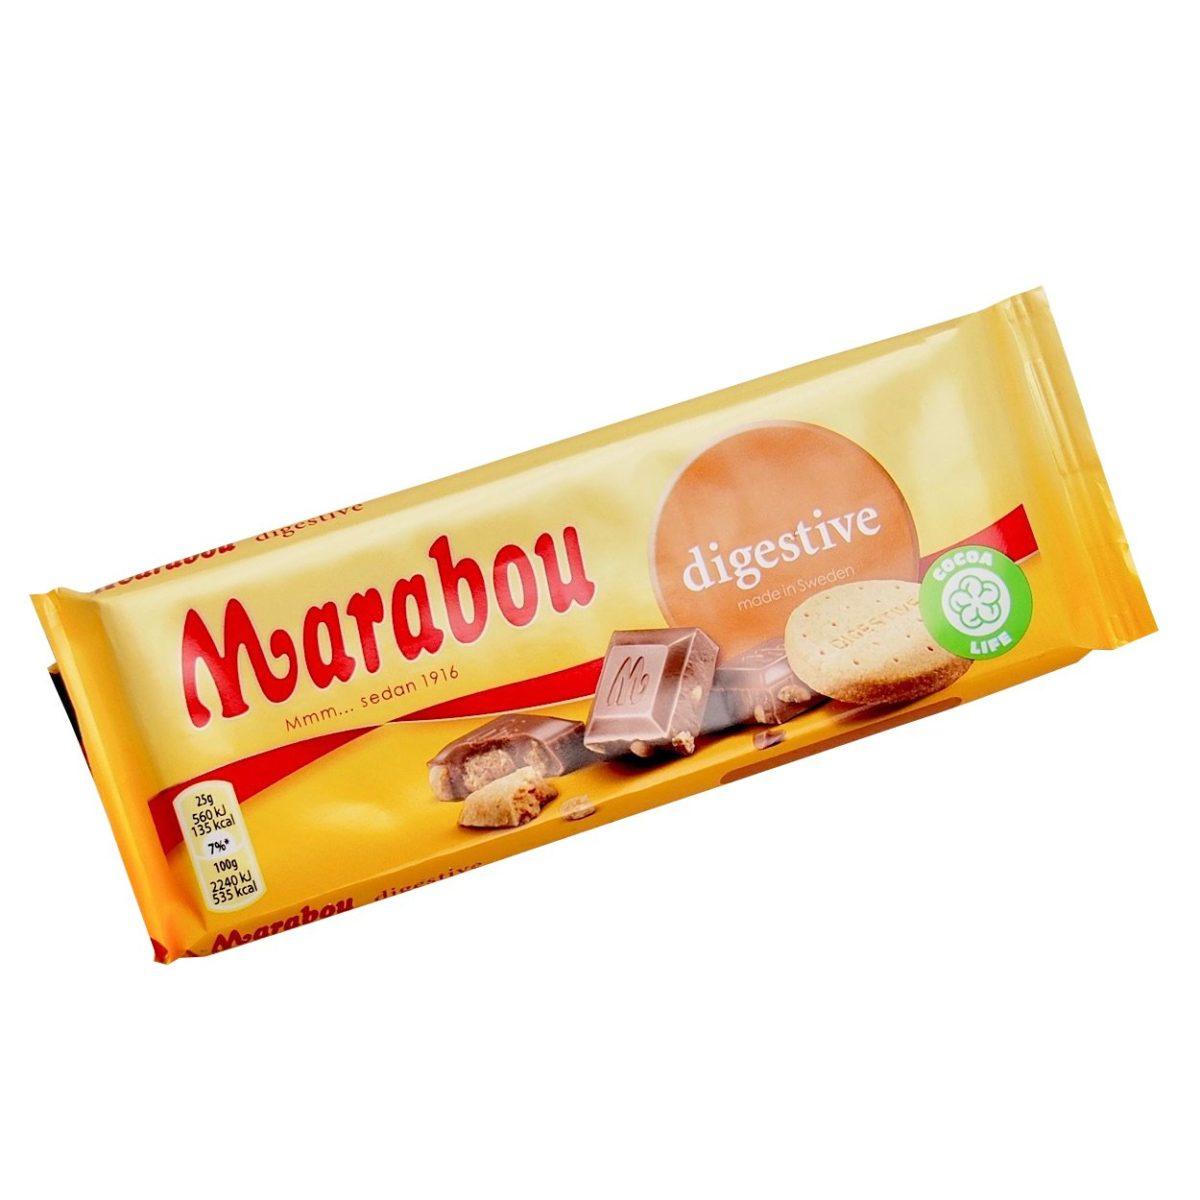 Marabou digestive (100g) 2